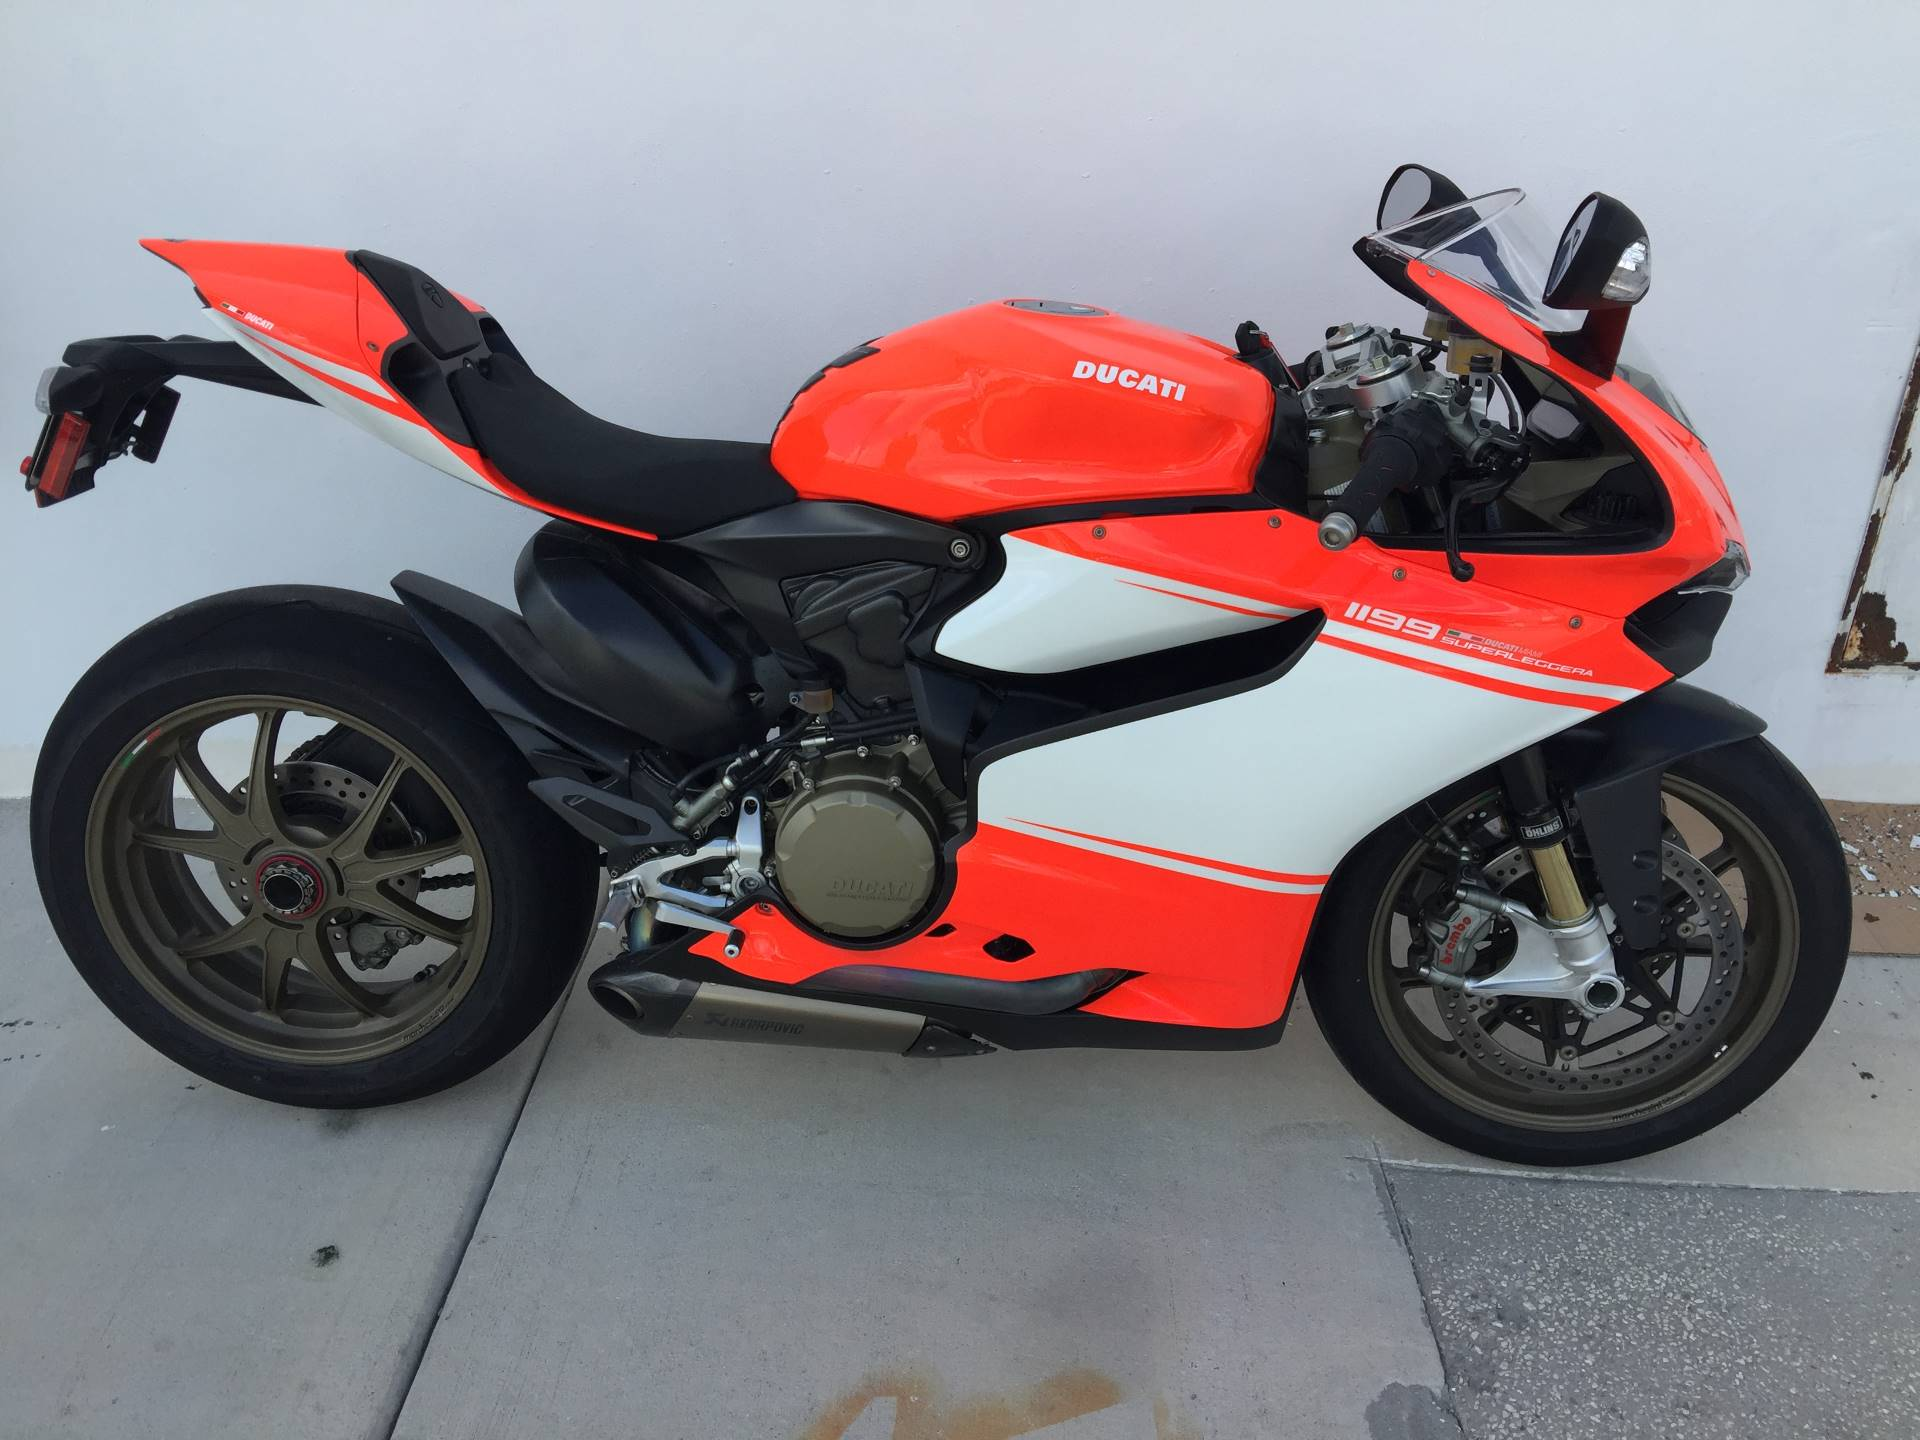 2014 Superbike 1199 SL Panigale